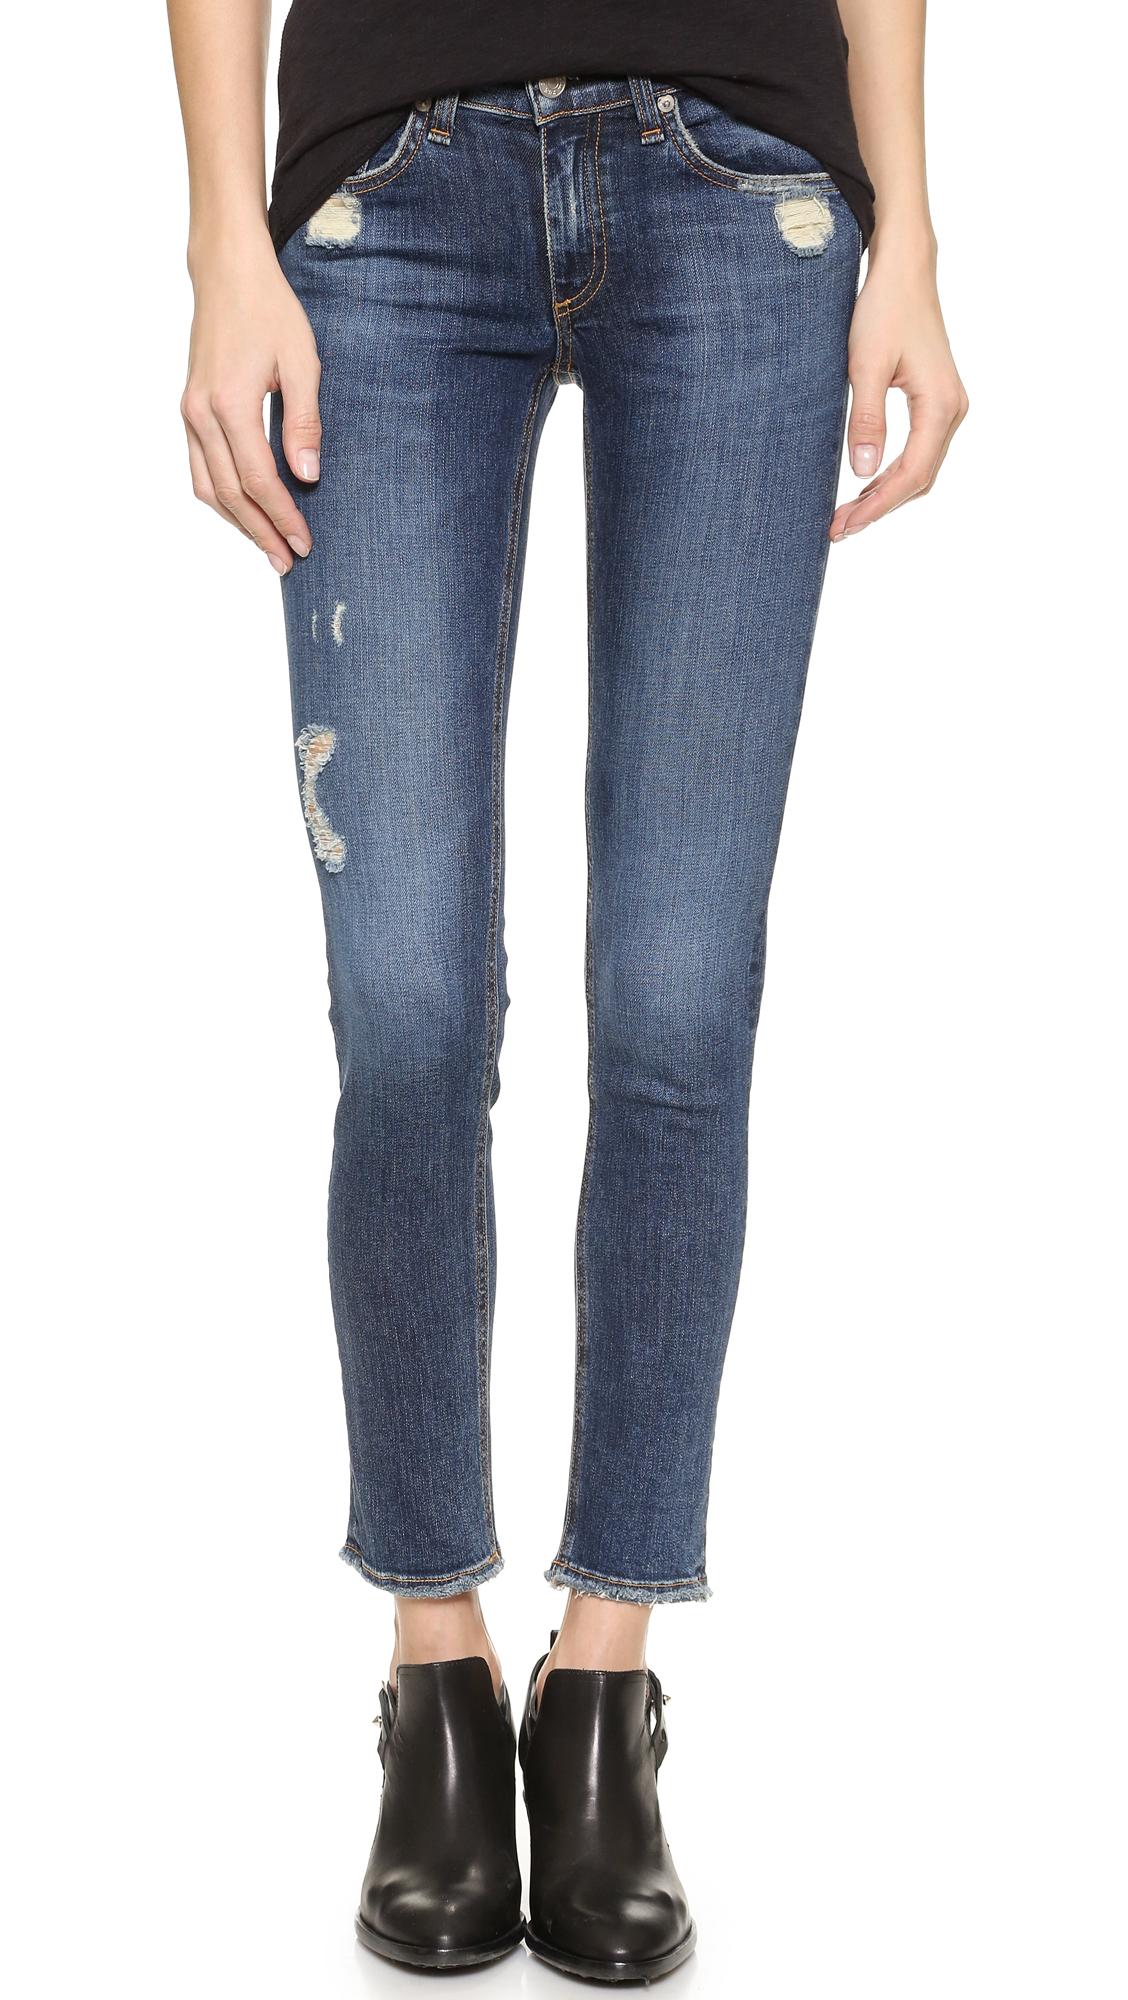 Rag & Bone/JEAN The Frayed Skinny Jeans   15% off first app ...